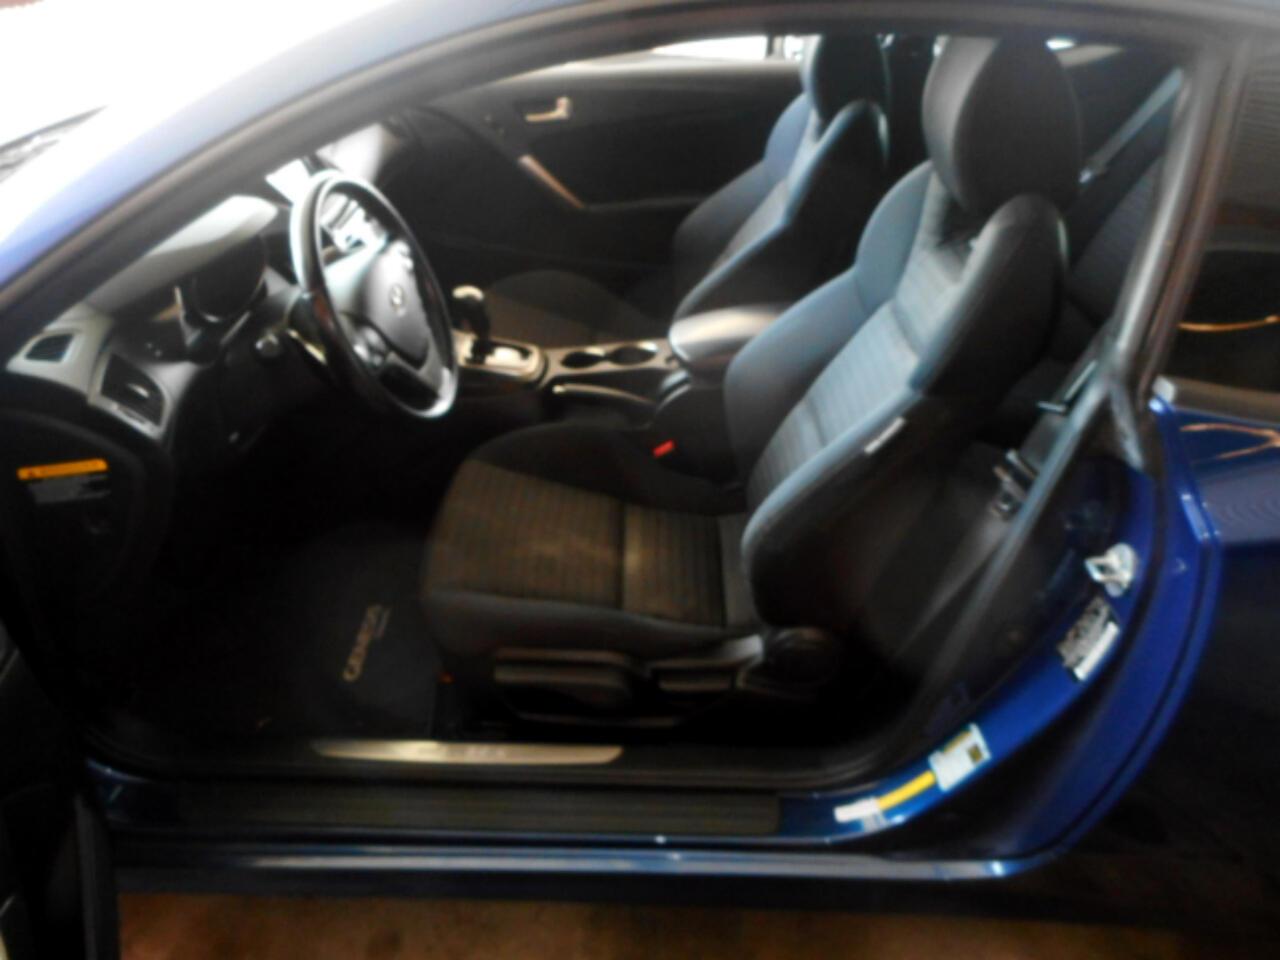 2014 Hyundai Genesis Coupe 2.0T 8AT